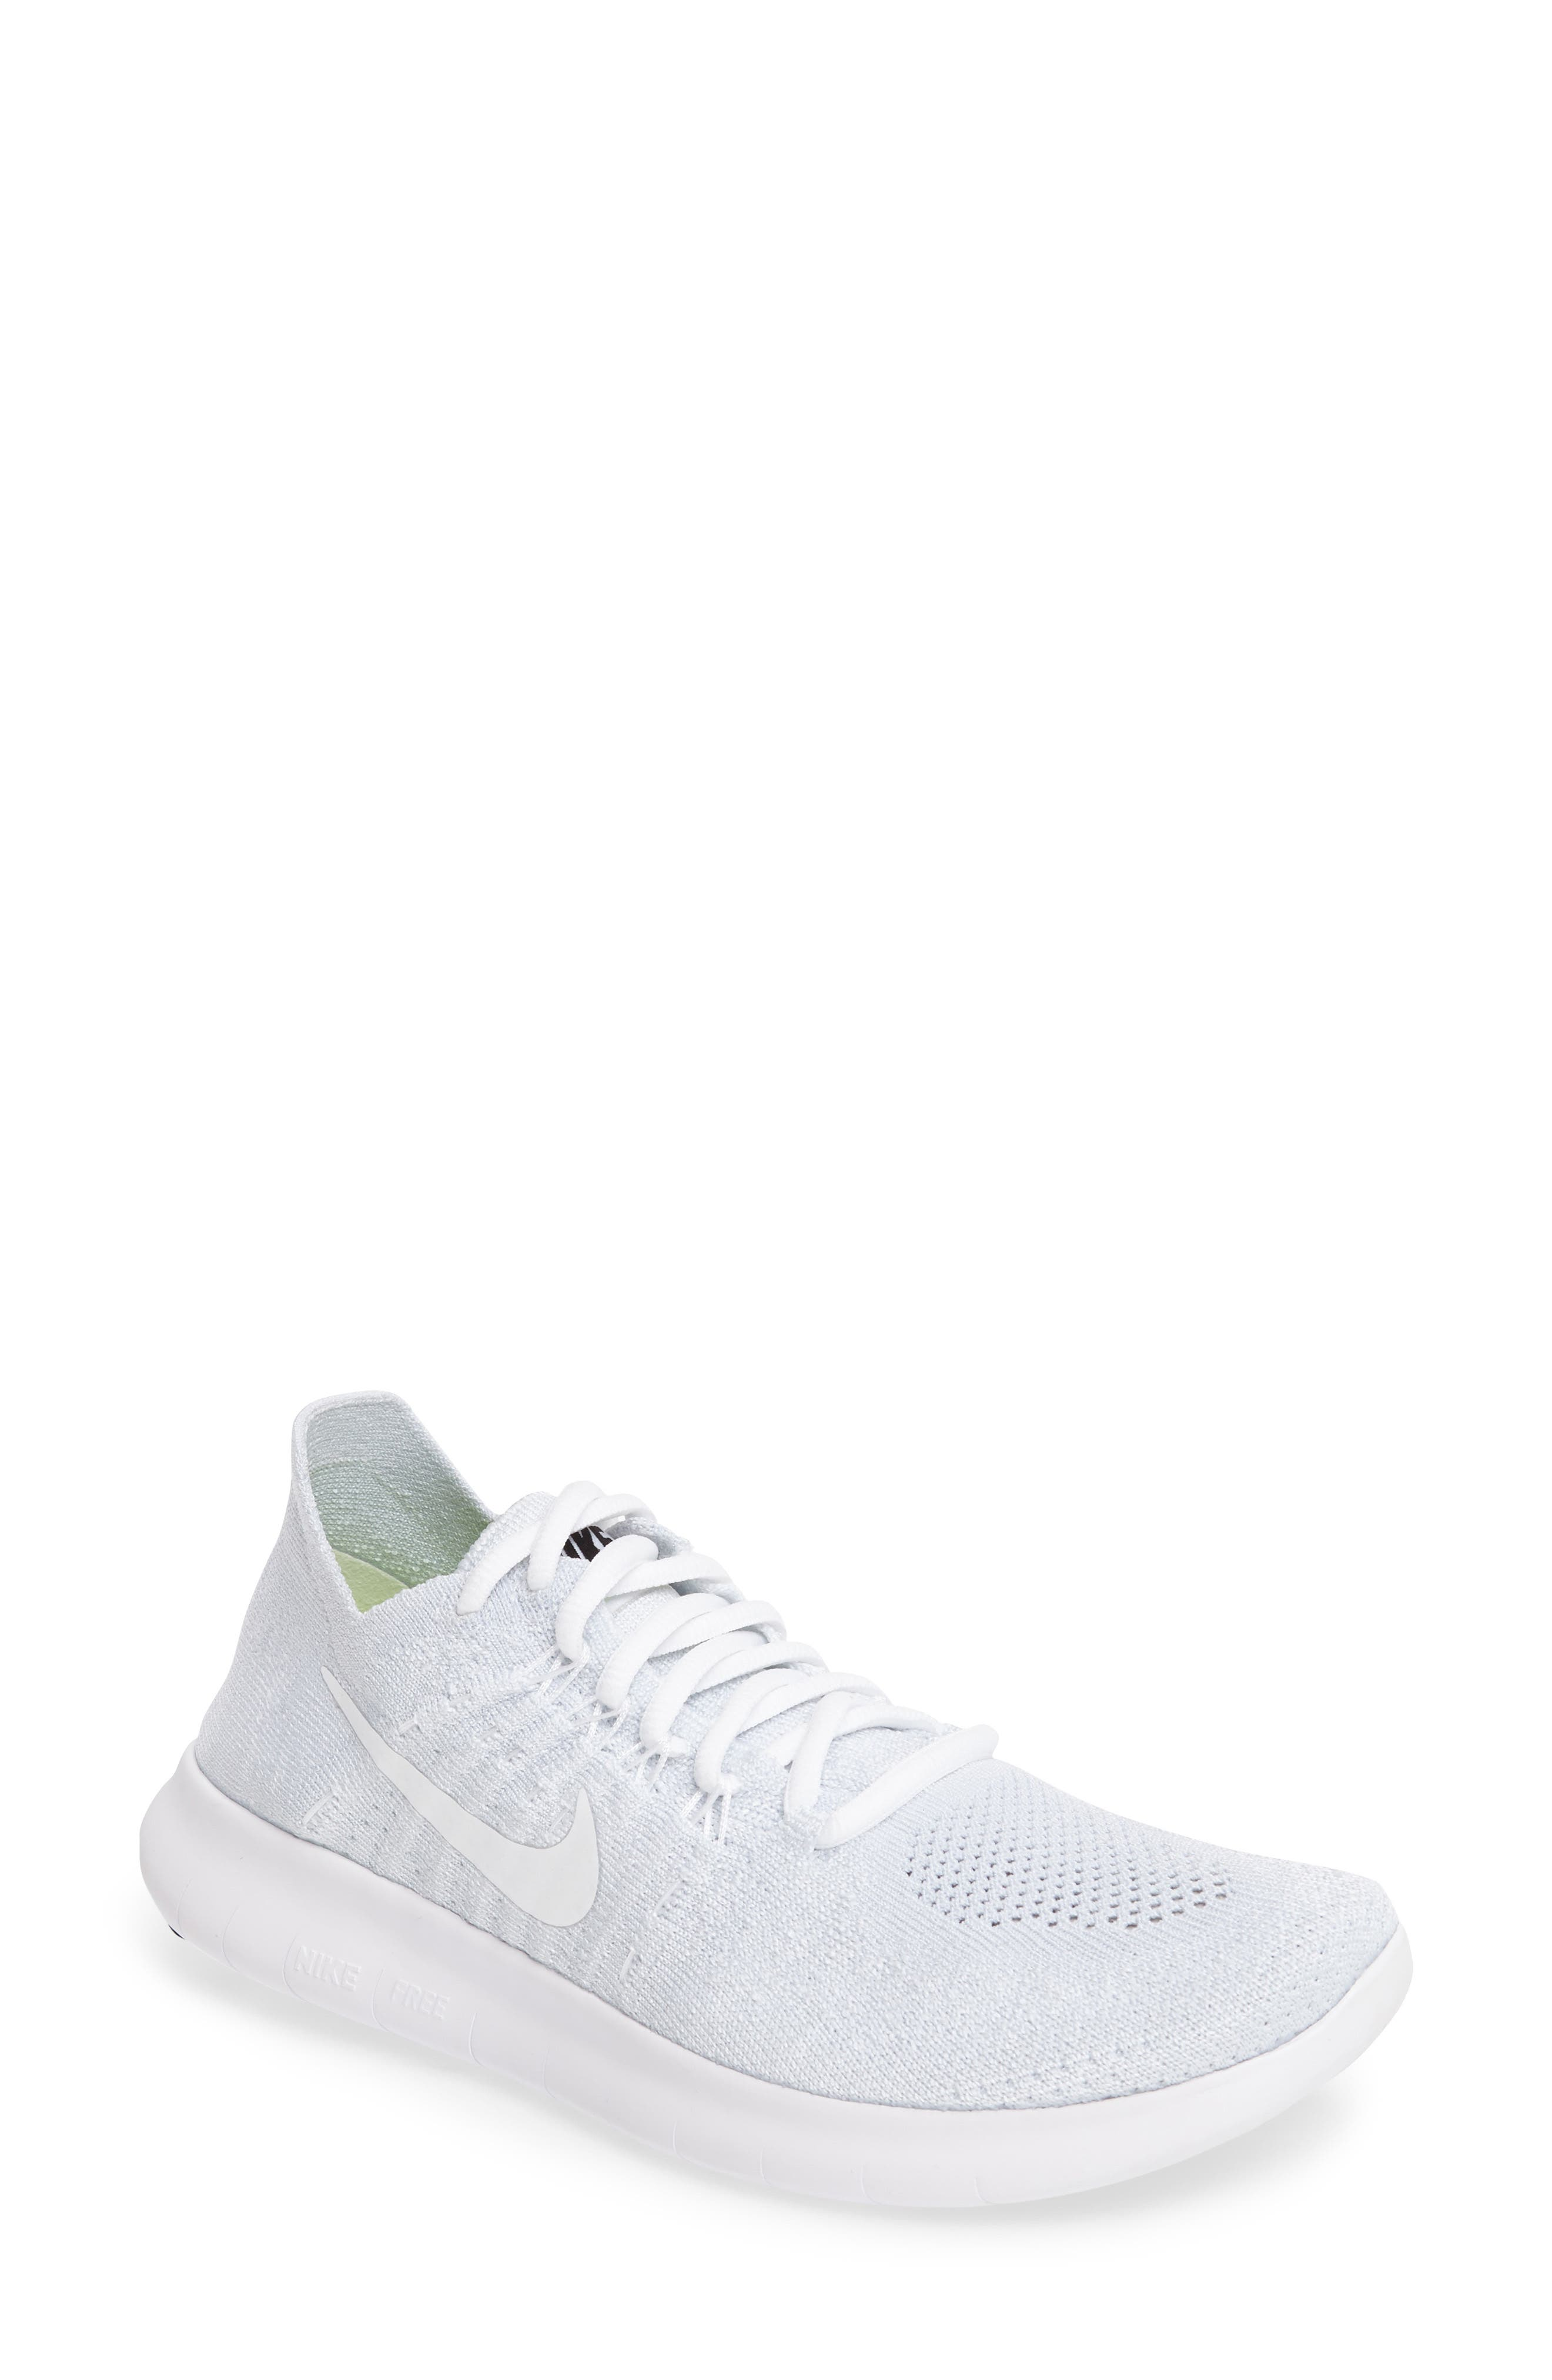 Free Run Flyknit 2 Running Shoe,                         Main,                         color, White/ Platinum/ Black